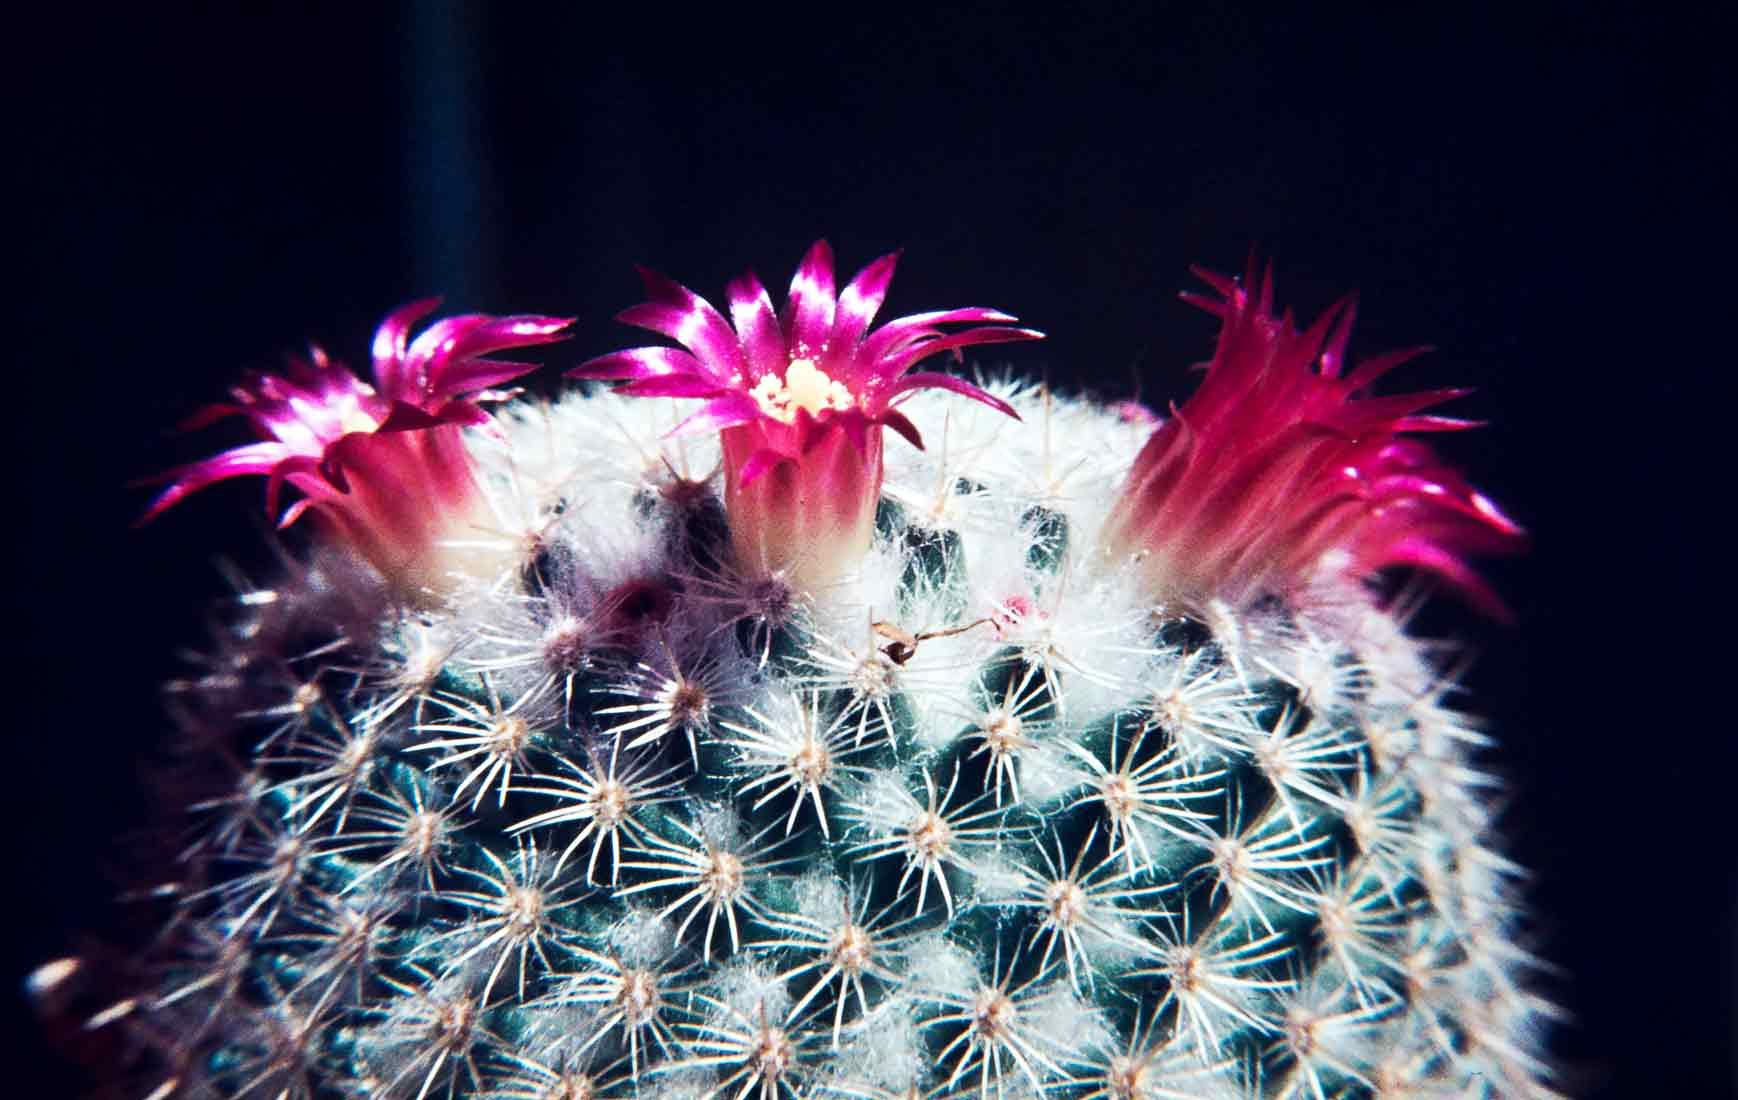 Mammillaria-klissingiana-1981